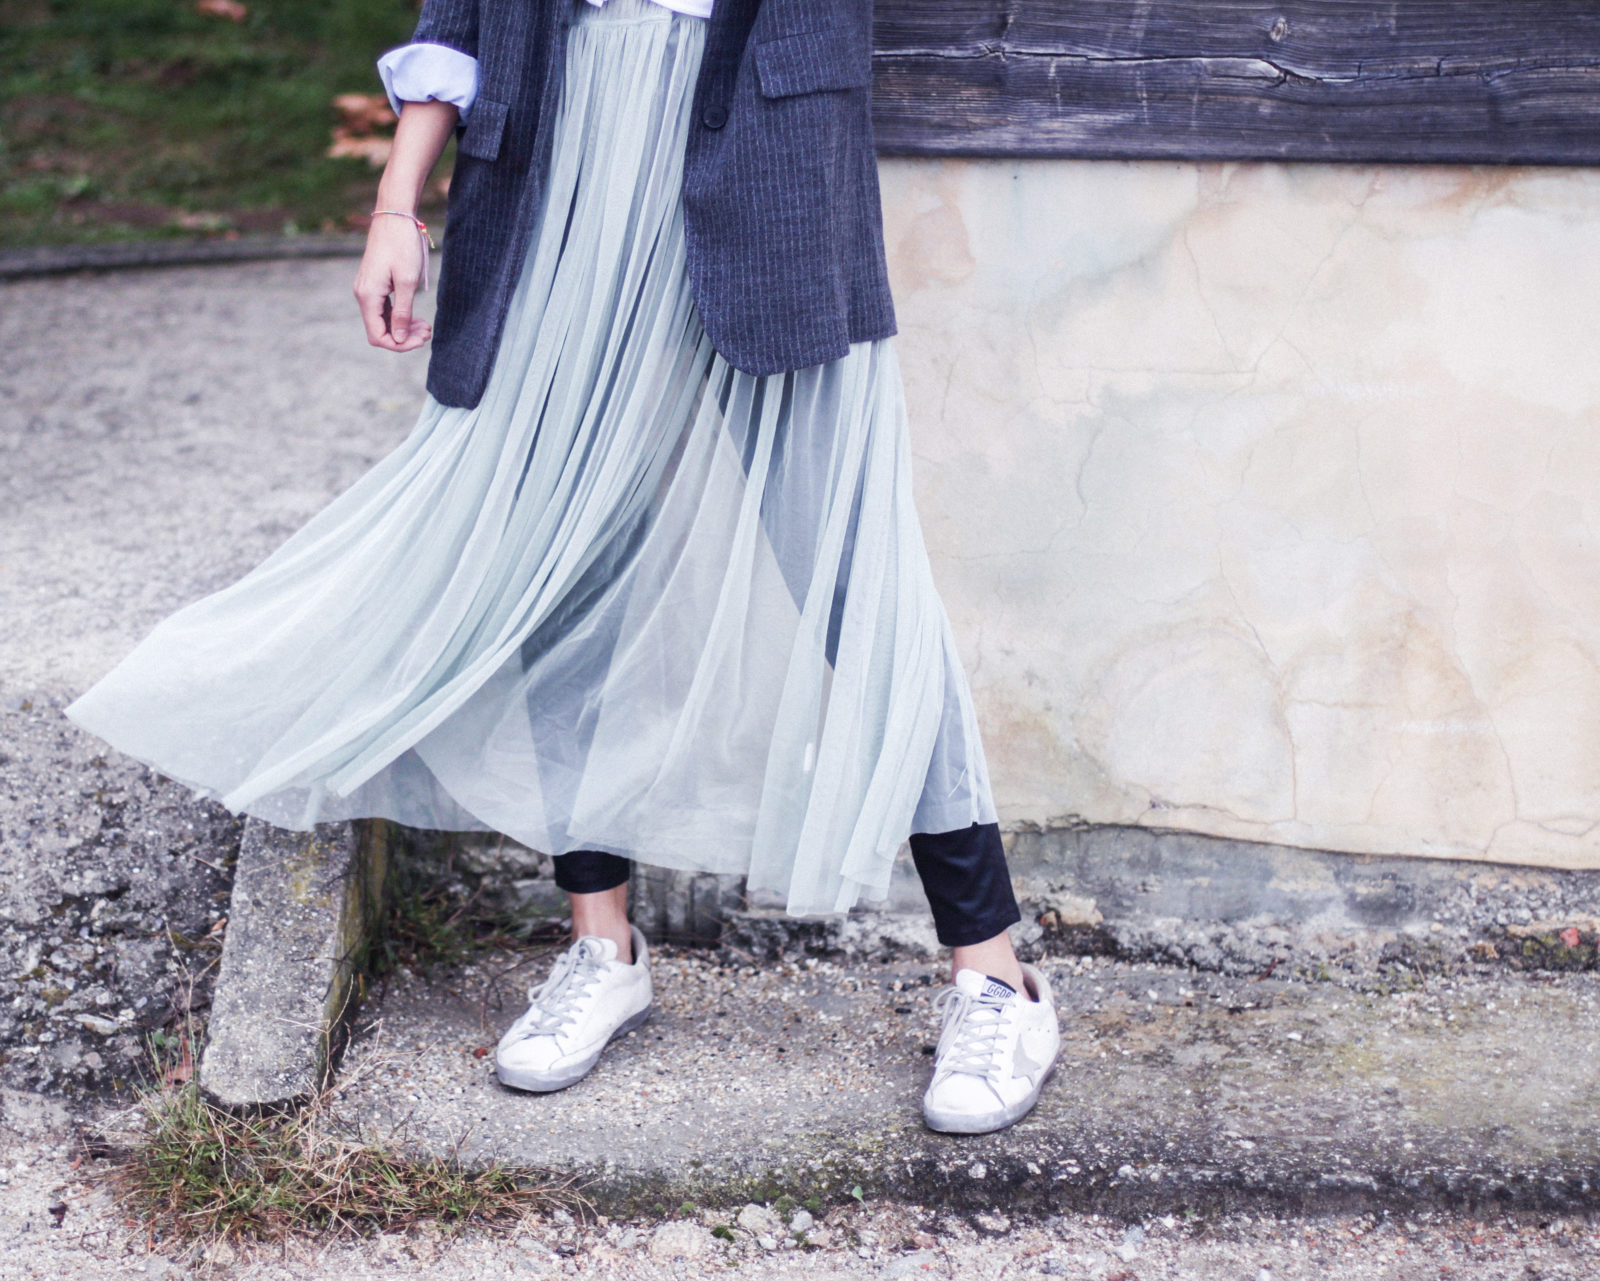 vestido_de_tul_sobre_pantalon_estilo_bailarina_blazer_oversize_pendientes_de_aros_choker_tendencias_trends_fall_2016_street_style_donkeycool-28